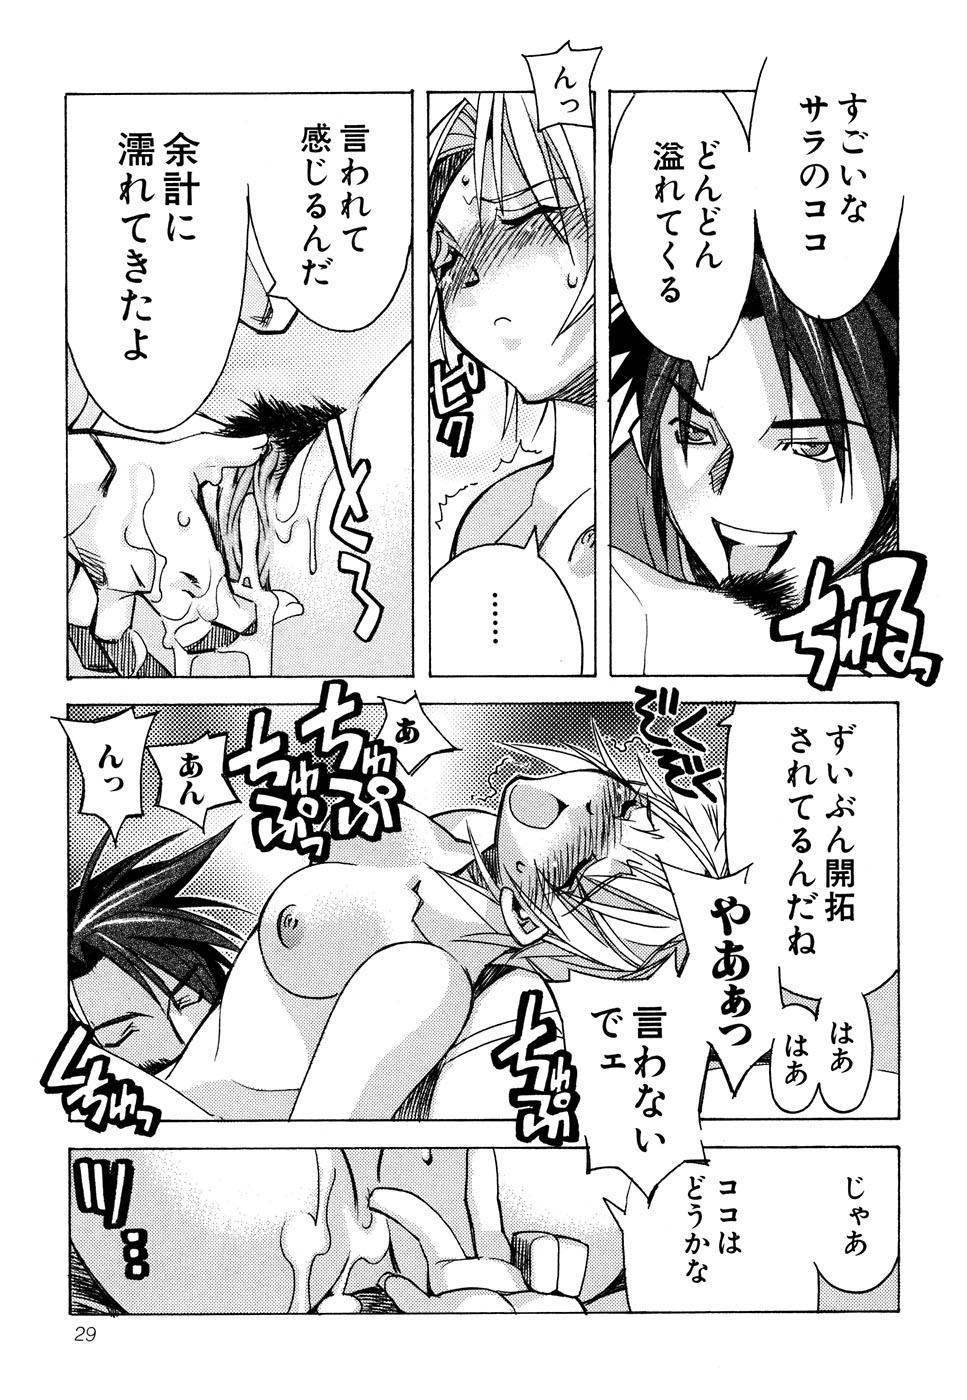 G-drive Vol.1 Ryoujokuhen 28